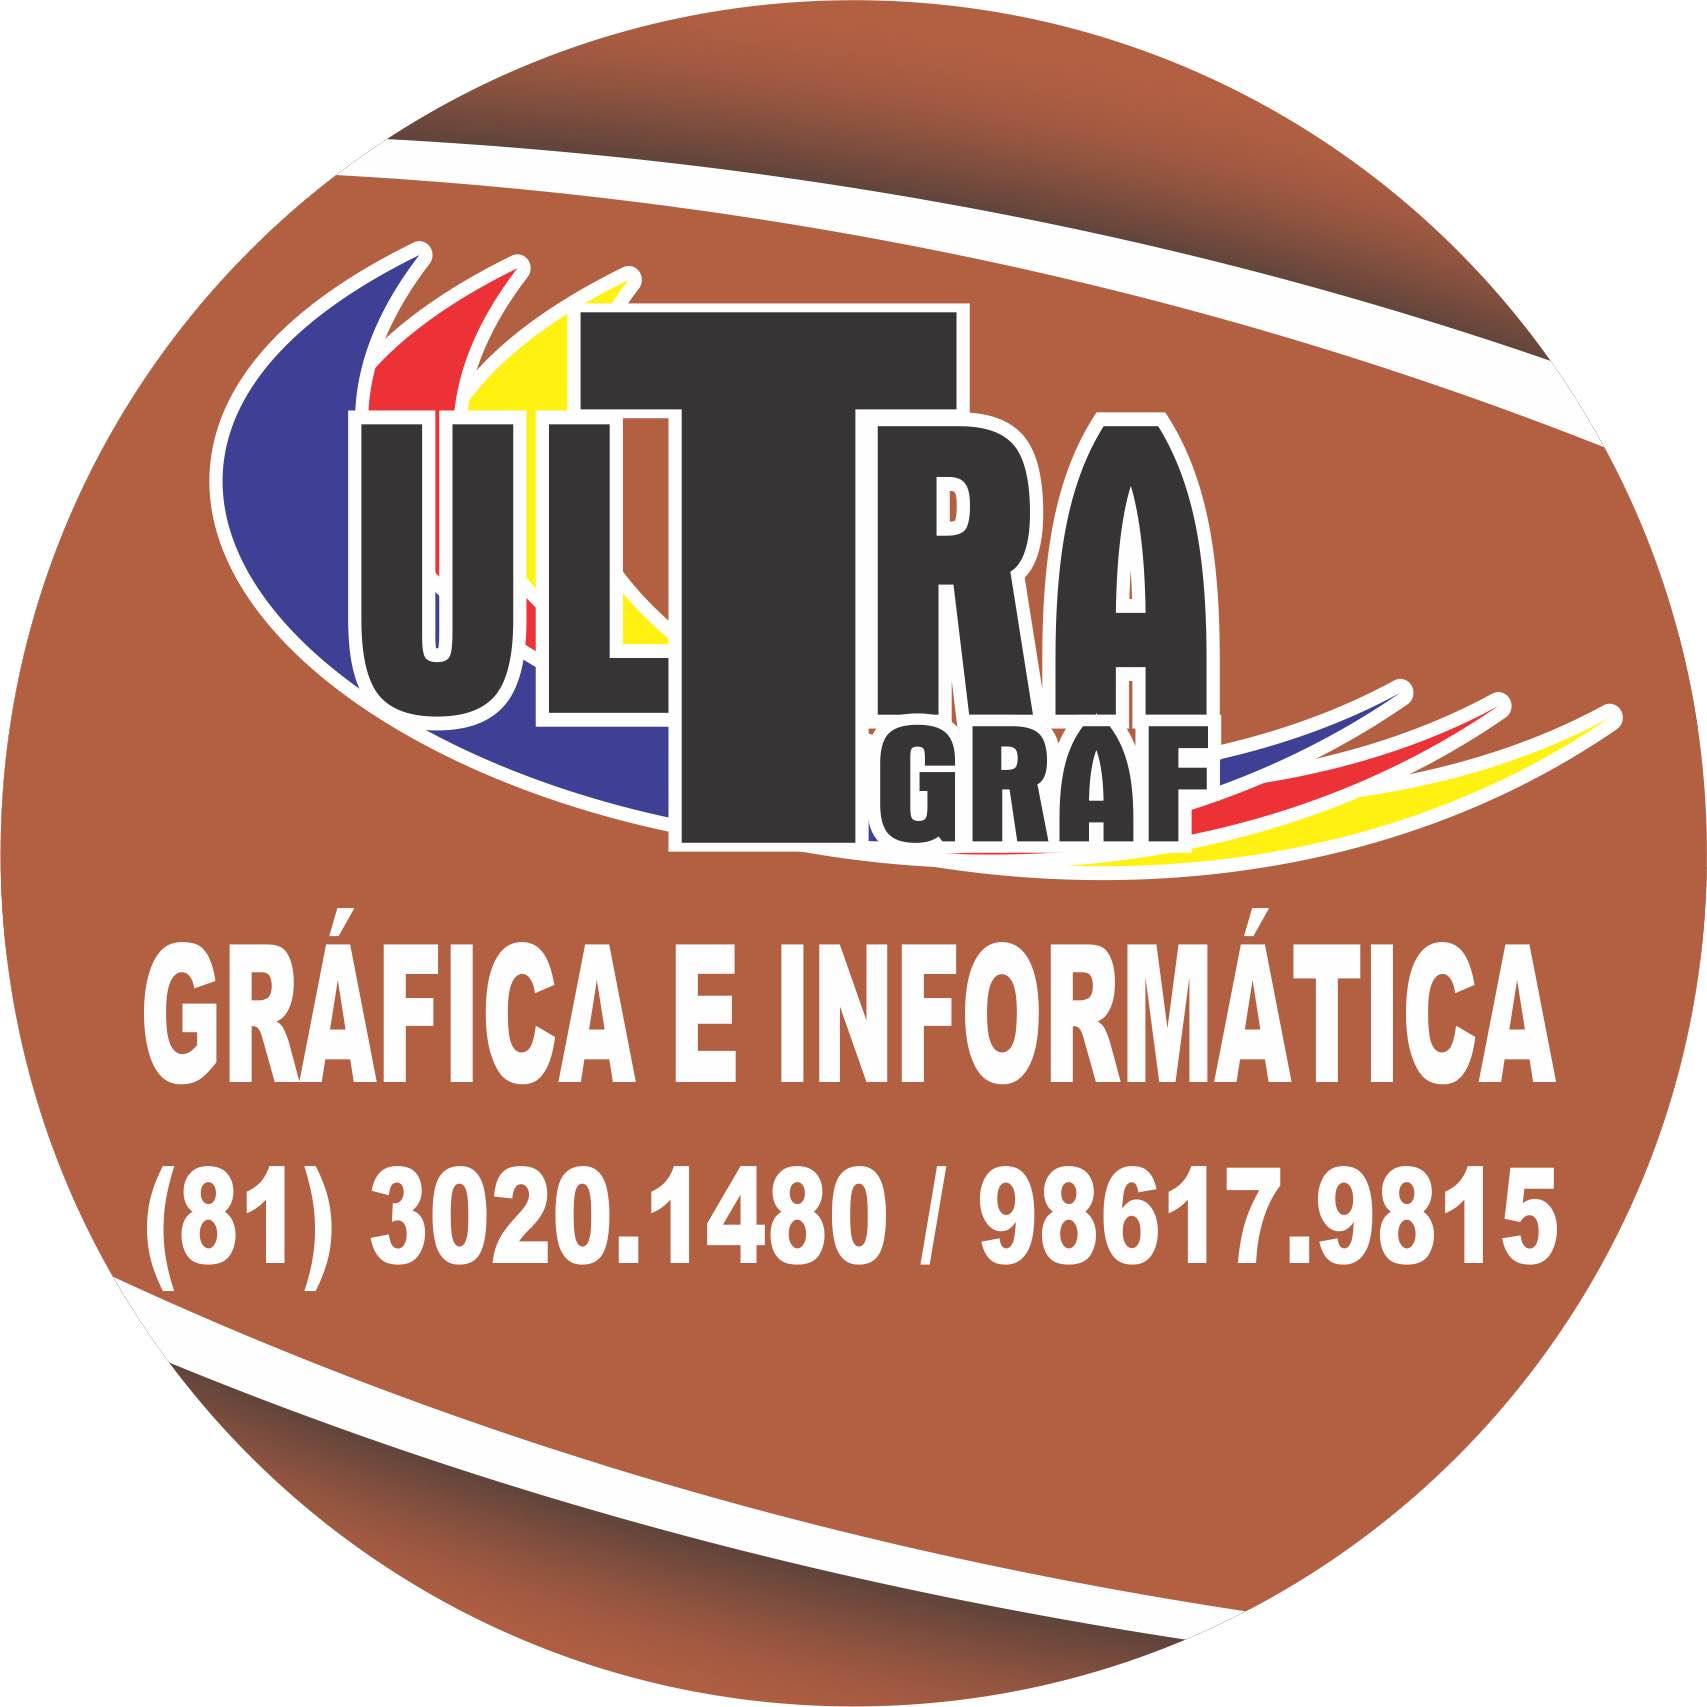 ULTRAF - GRÁFICA E INFORMÁTICA